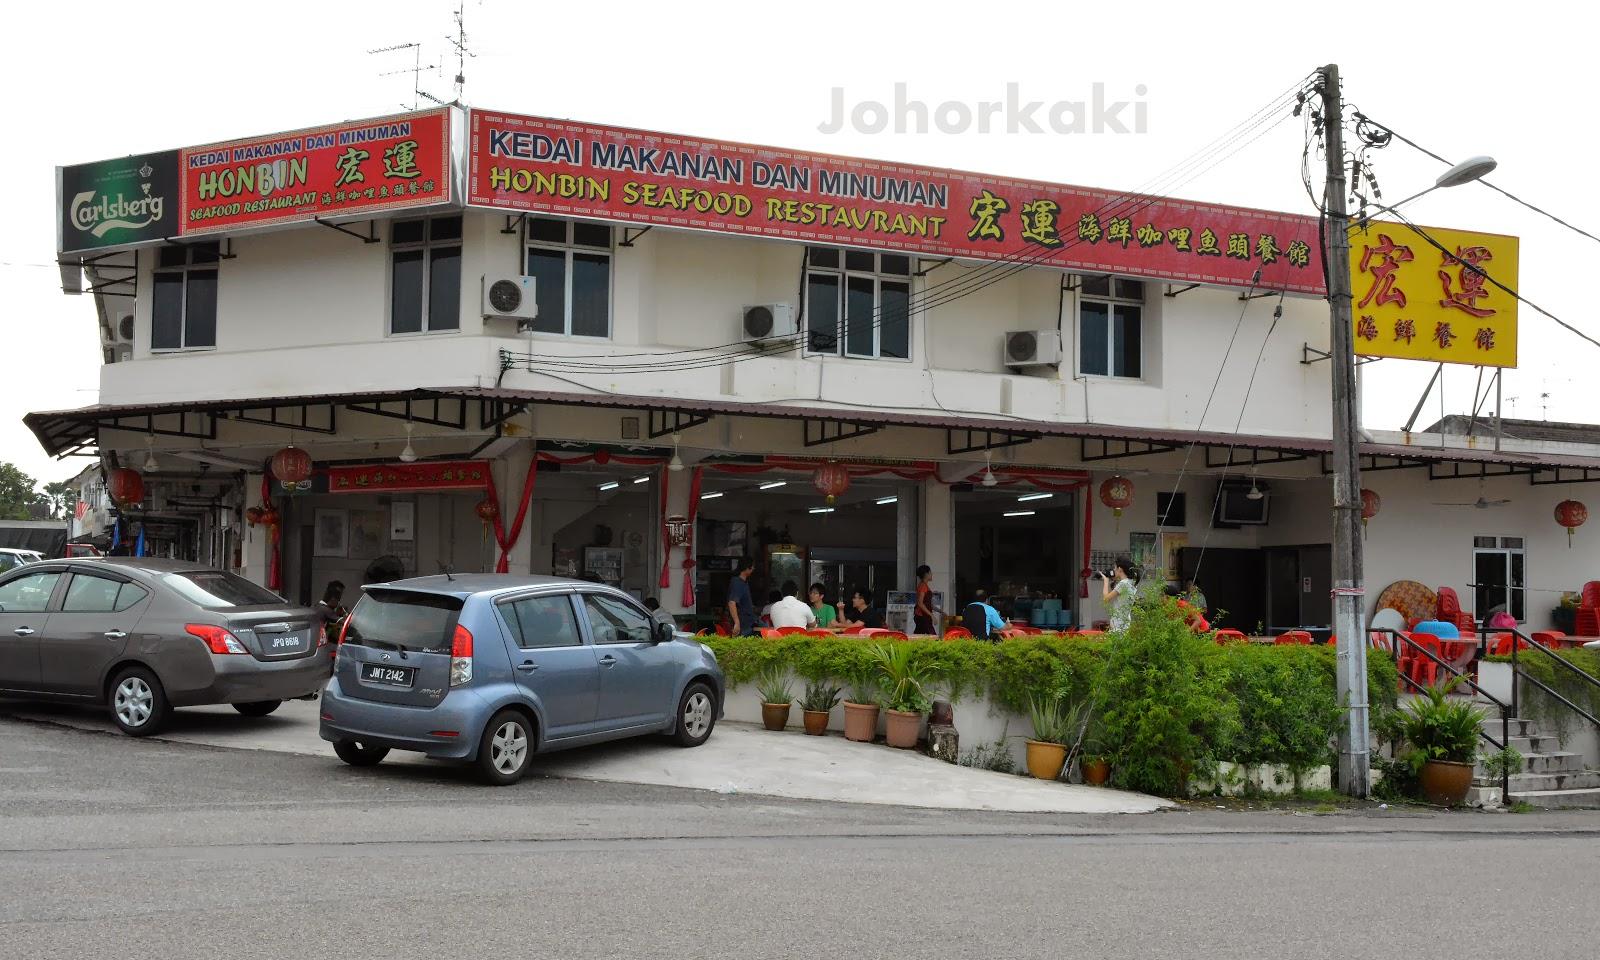 Johor bahru honbin seafood restaurant 宏运海鲜 in permas jaya